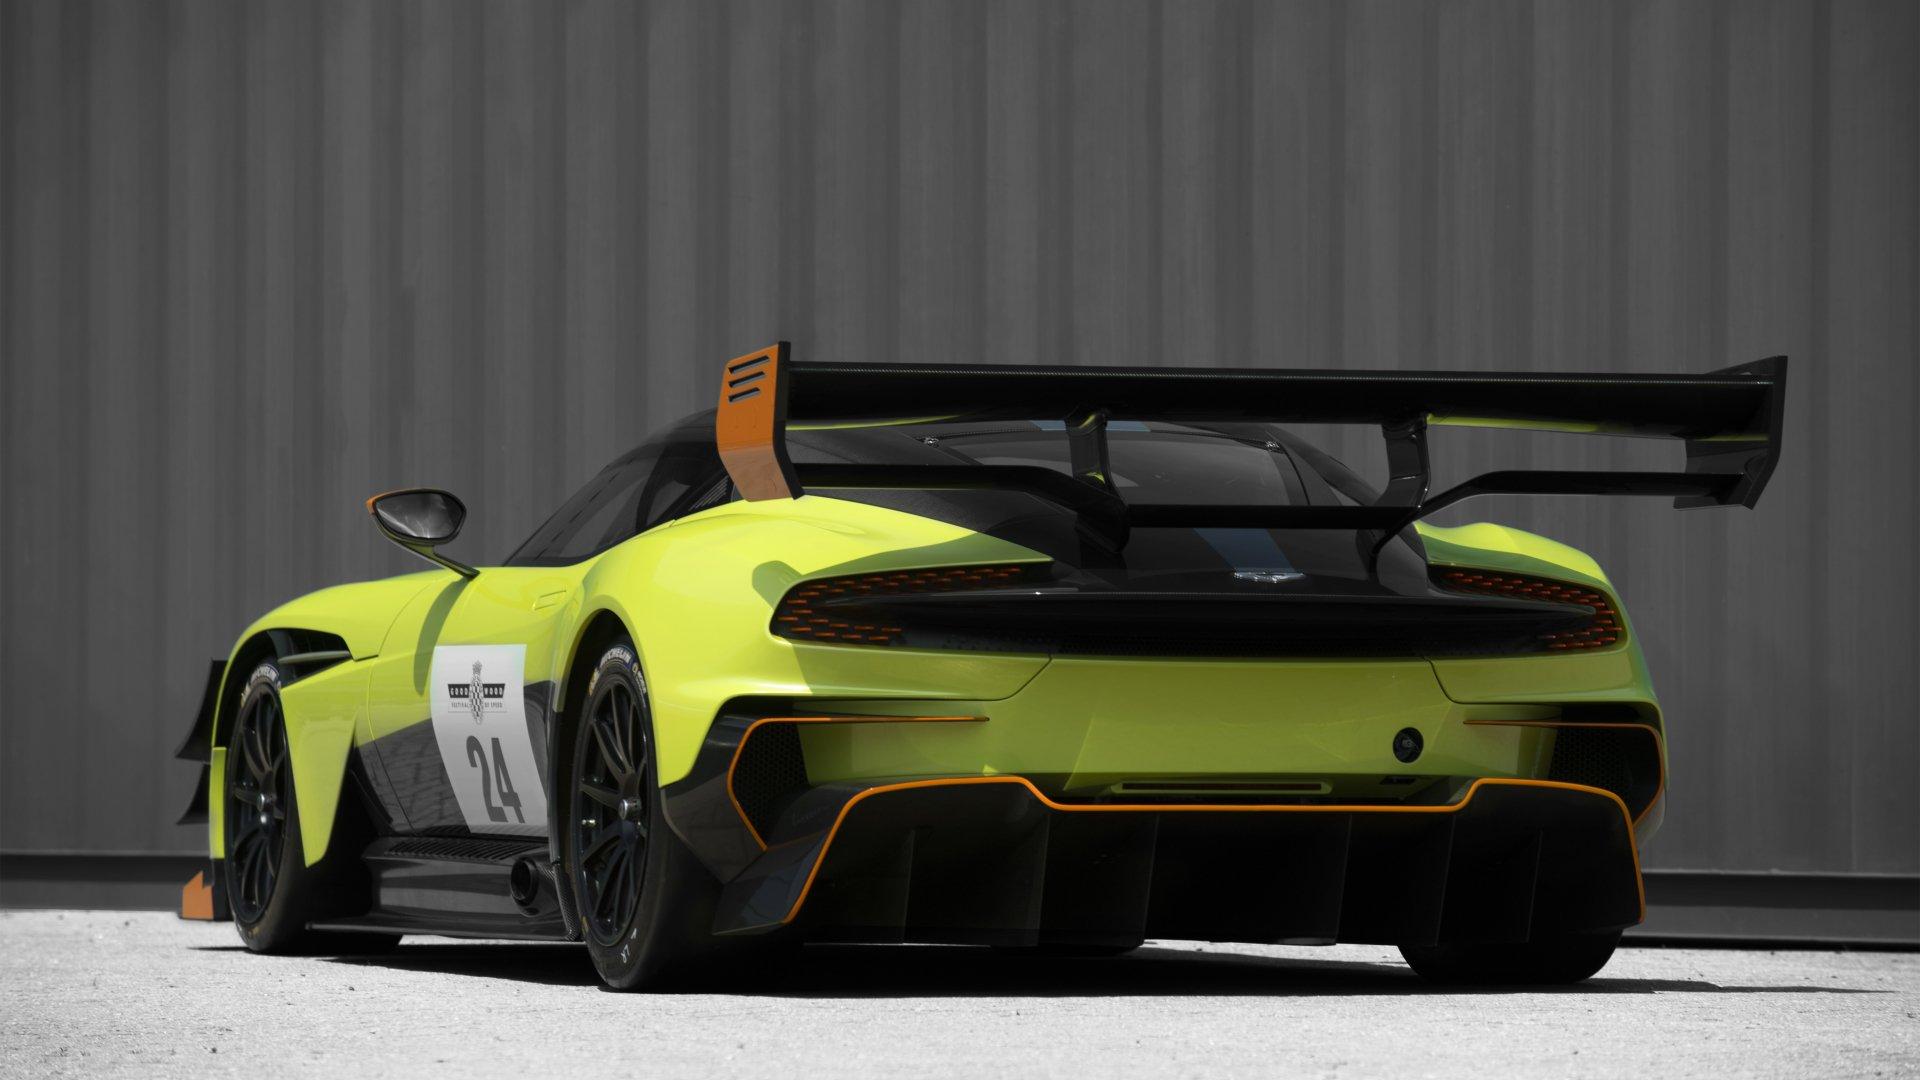 Véhicules - Aston Martin Vulcan  Aston Martin Vulcan AMR Pro Aston Martin Supercar Fond d'écran